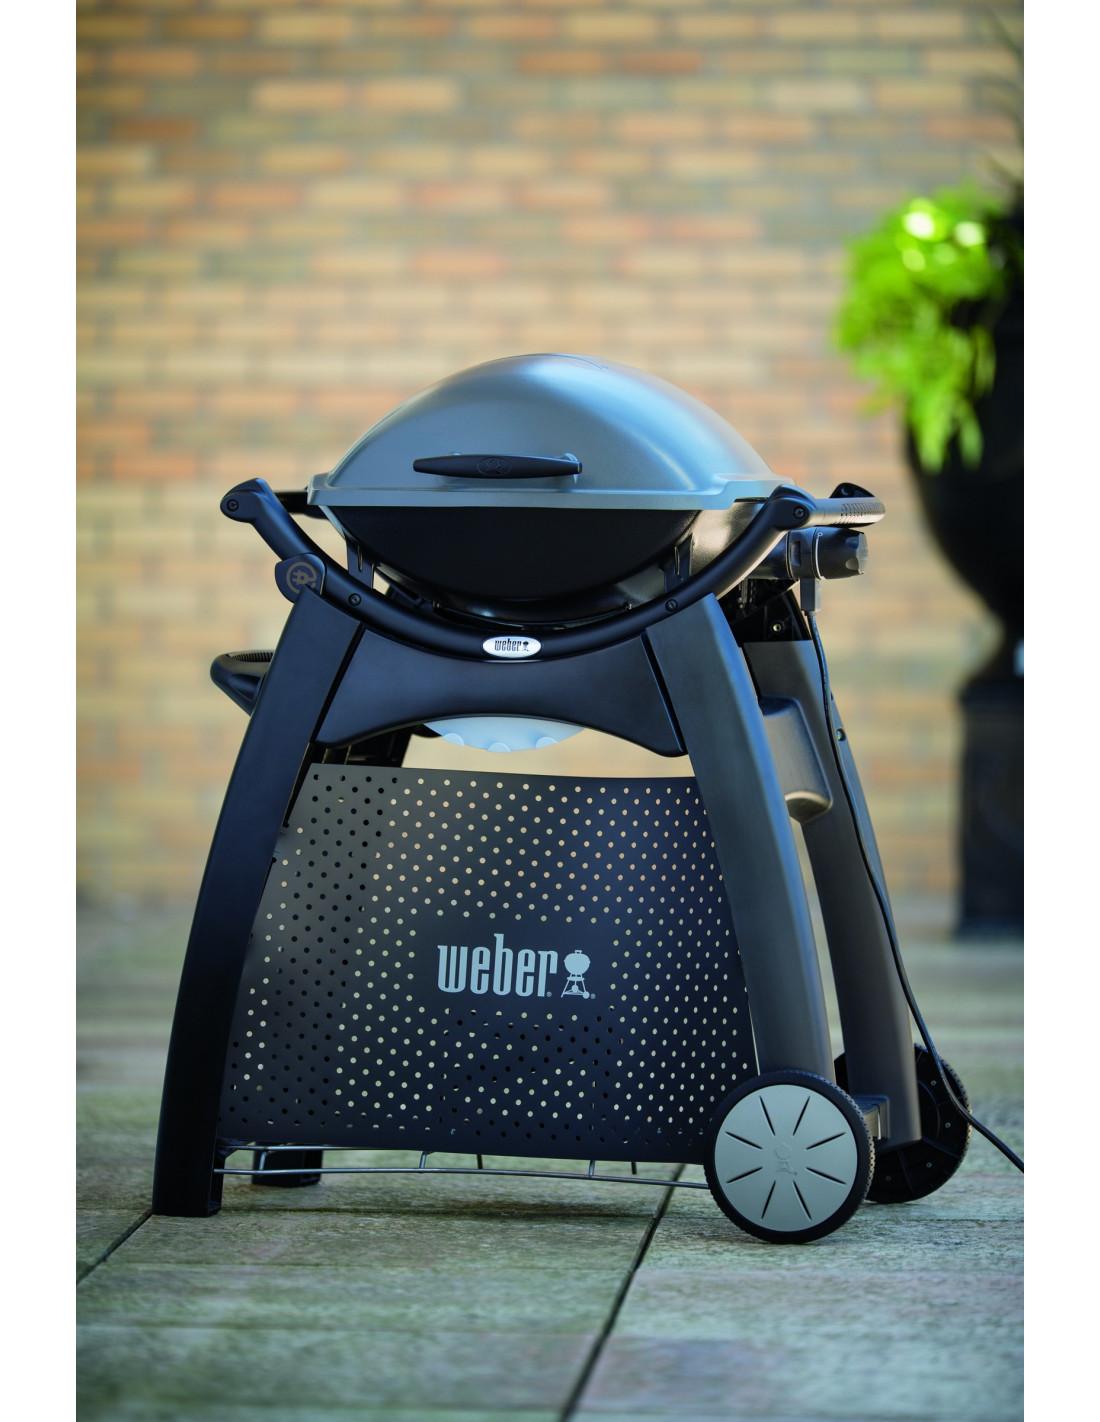 chariot deluxe pour barbecue weber gaz q series 2000. Black Bedroom Furniture Sets. Home Design Ideas